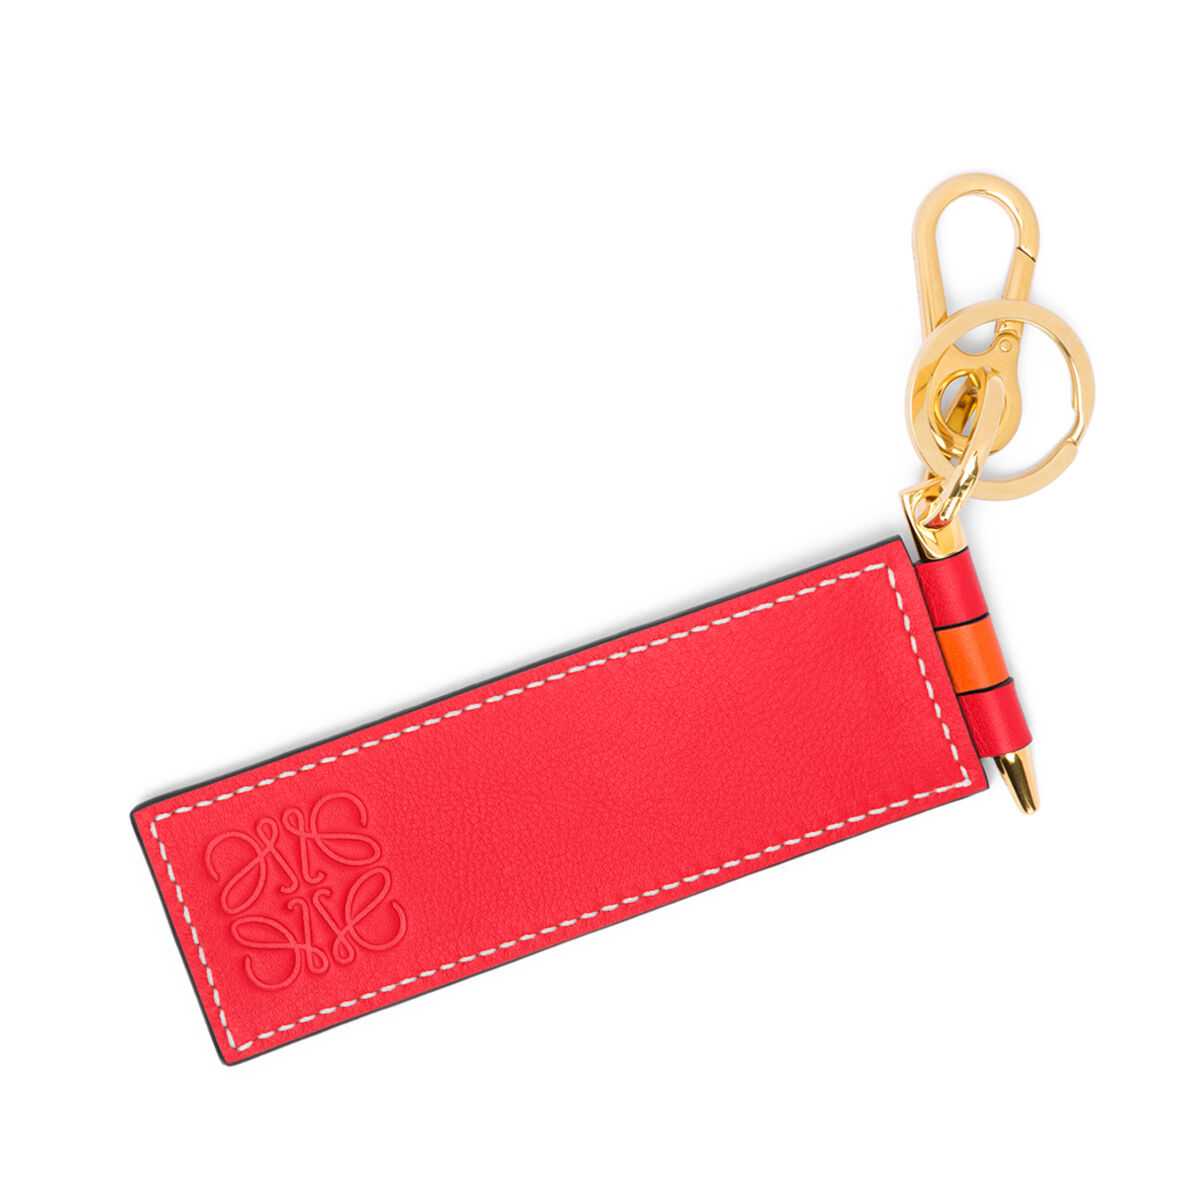 LOEWE Charm Loewe Gate Naranja/Rojo front